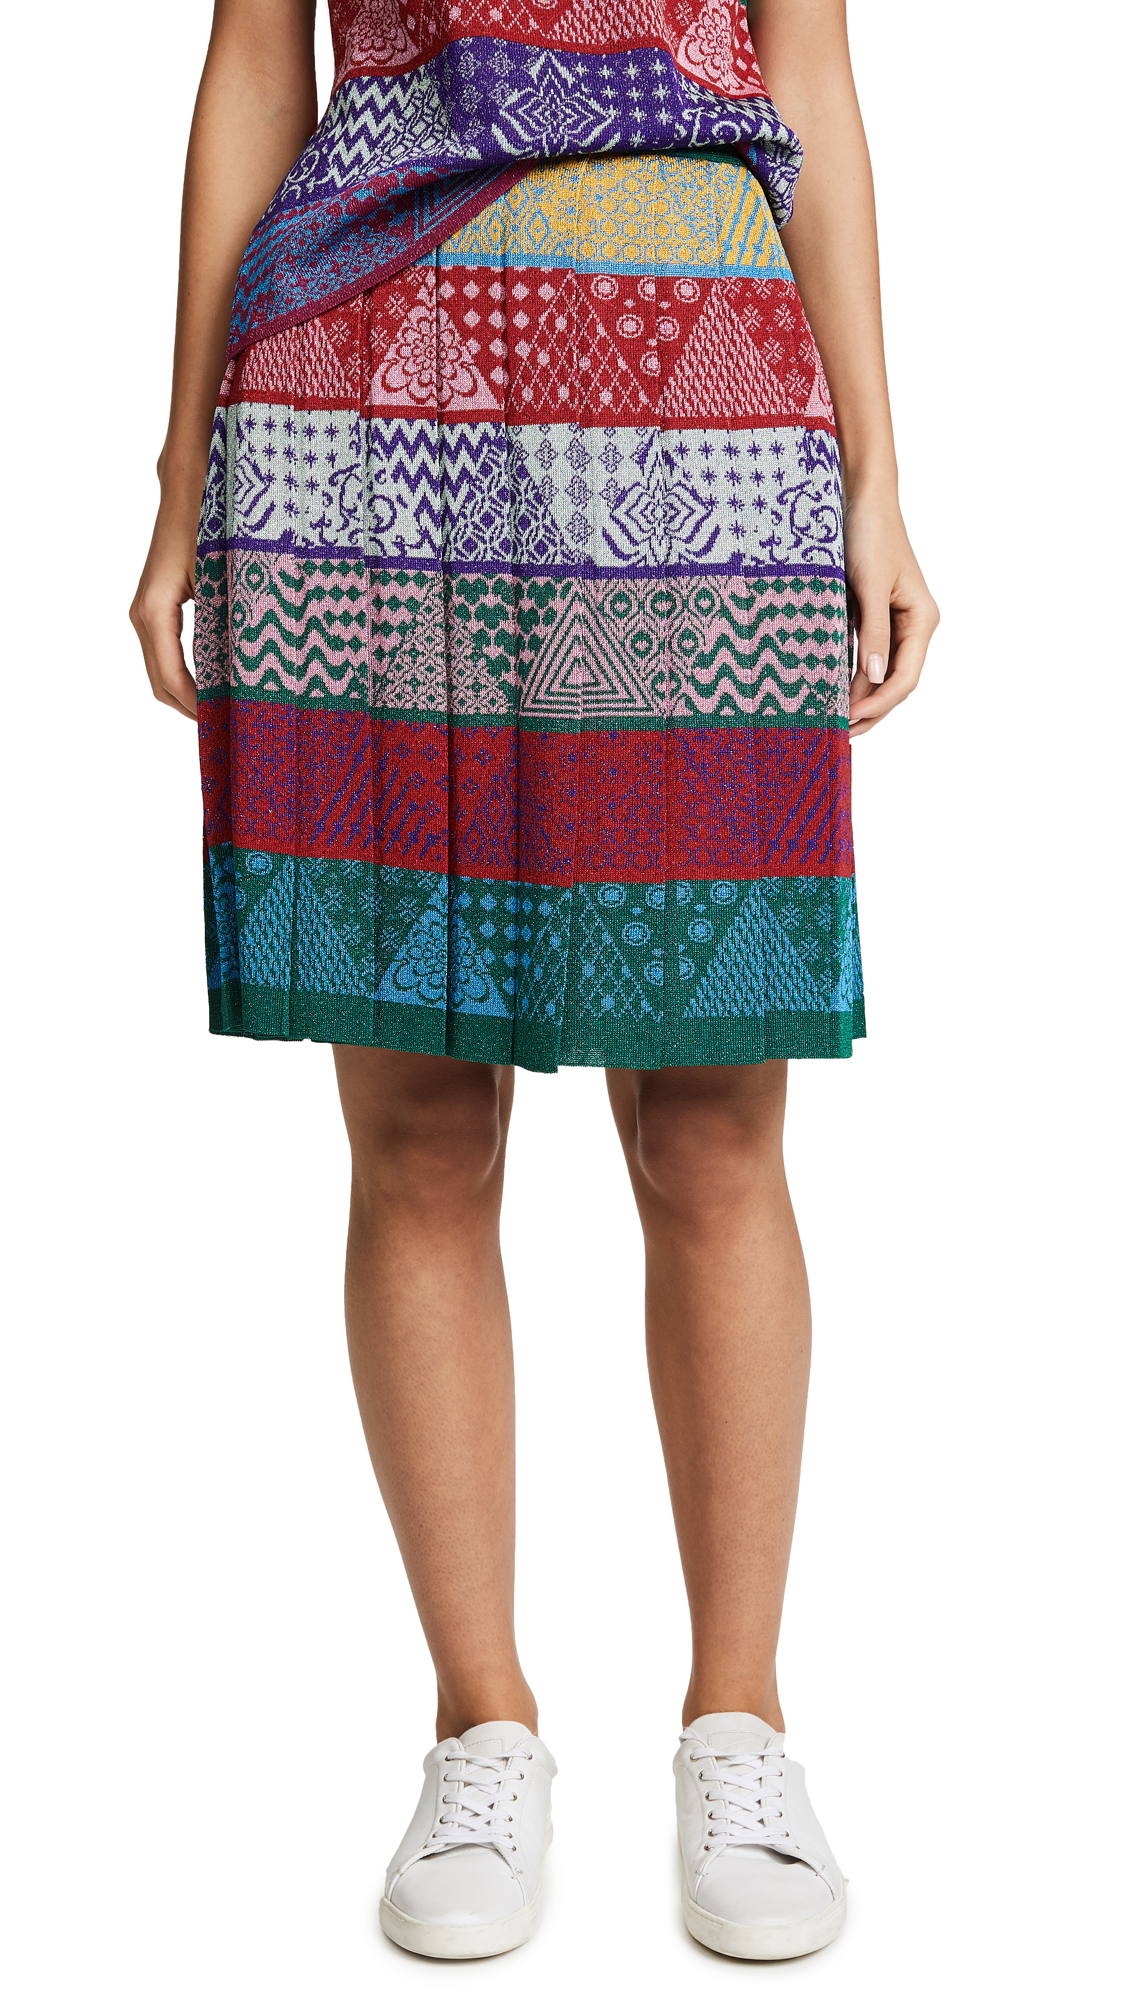 Mary Katrantzou Mandy Knit Sparkle Skirt - Patchwork Stripe